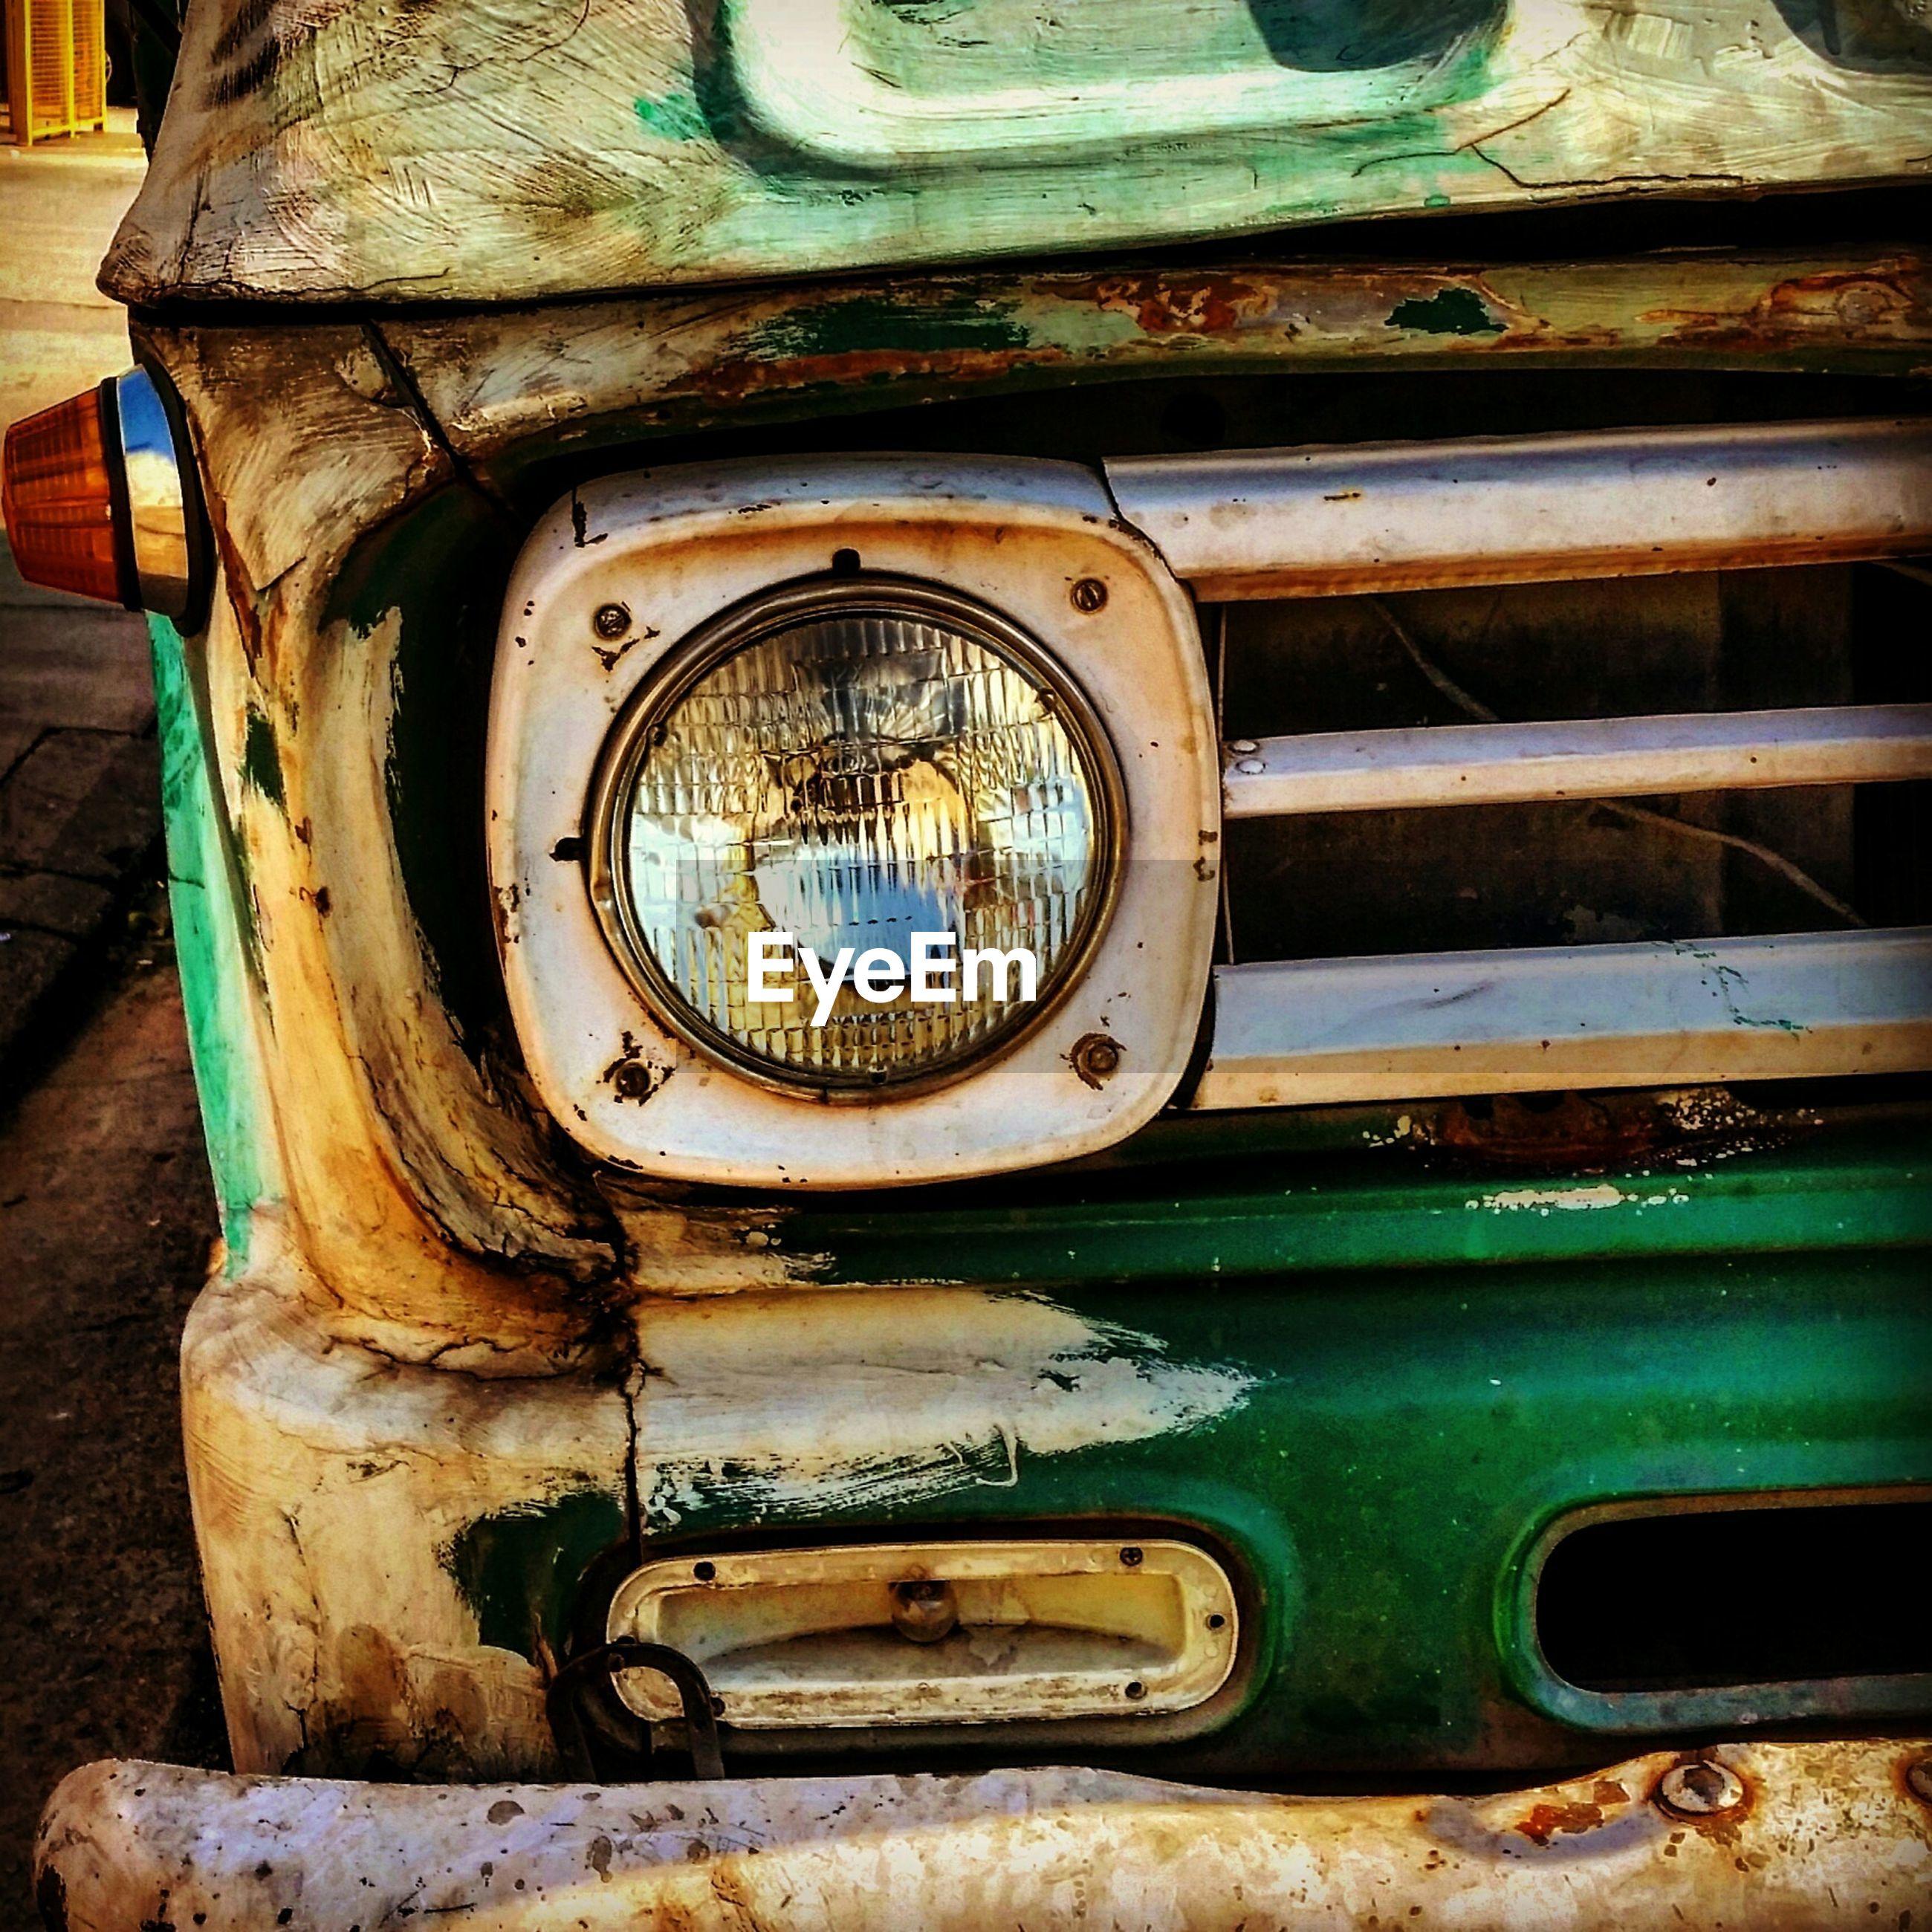 Close-up of abandoned truck headlight